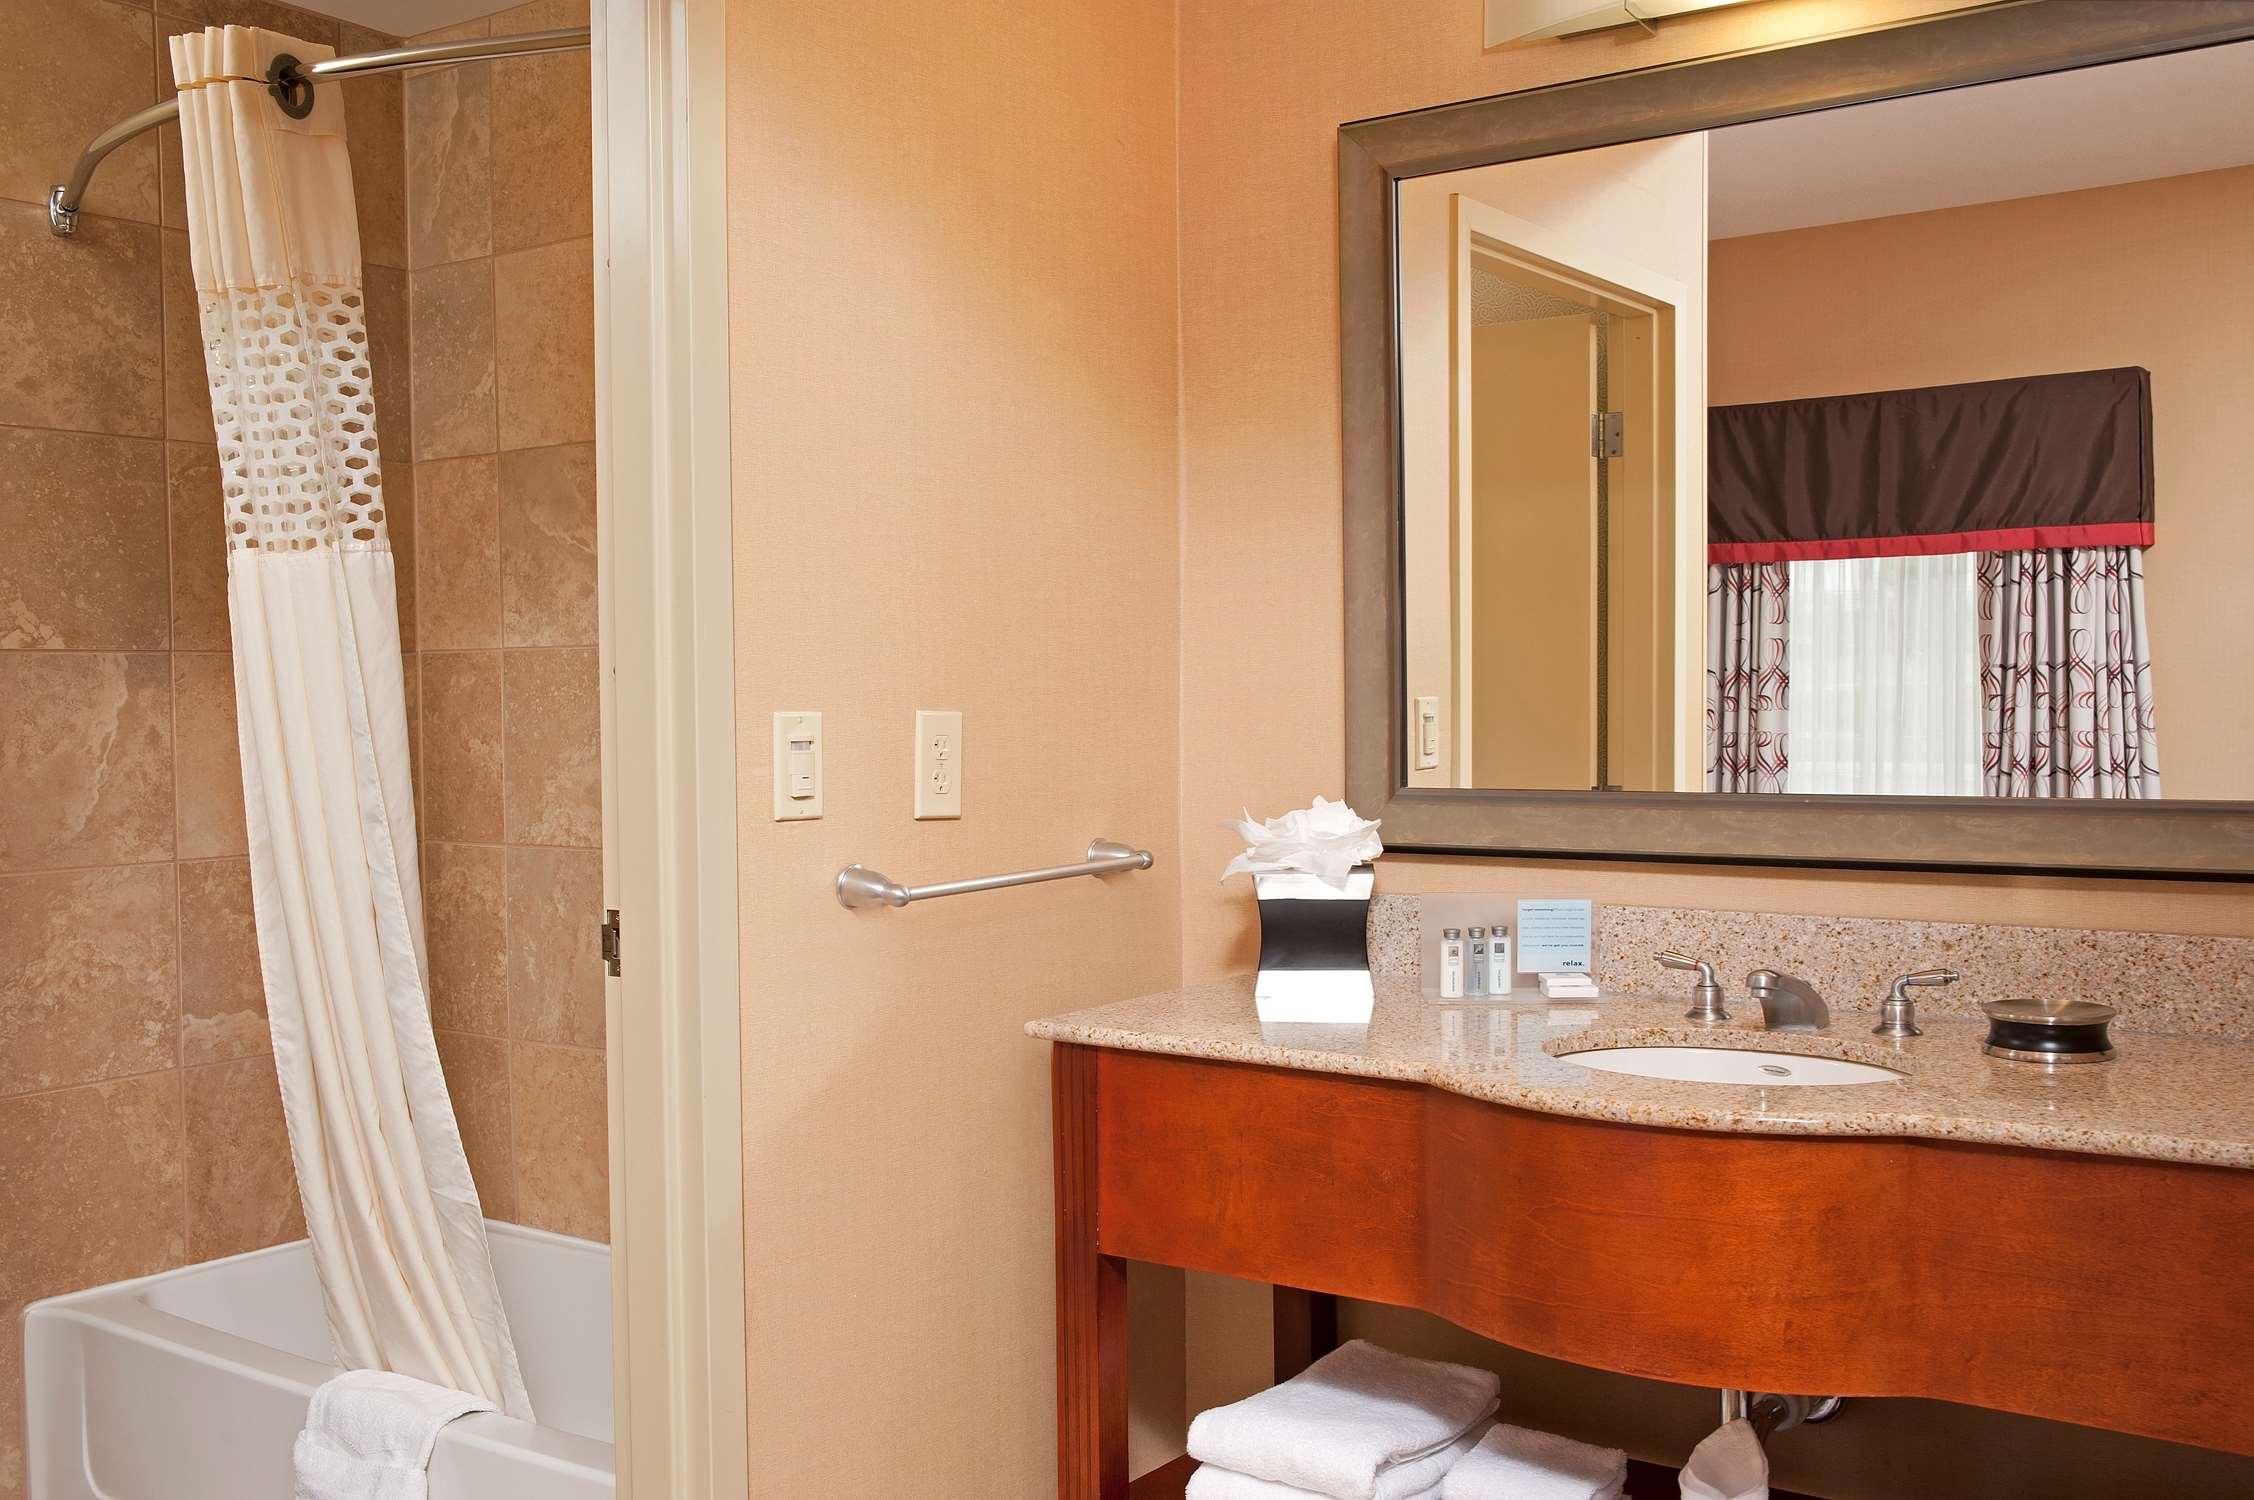 Hampton Inn & Suites Columbus-Easton Area image 23